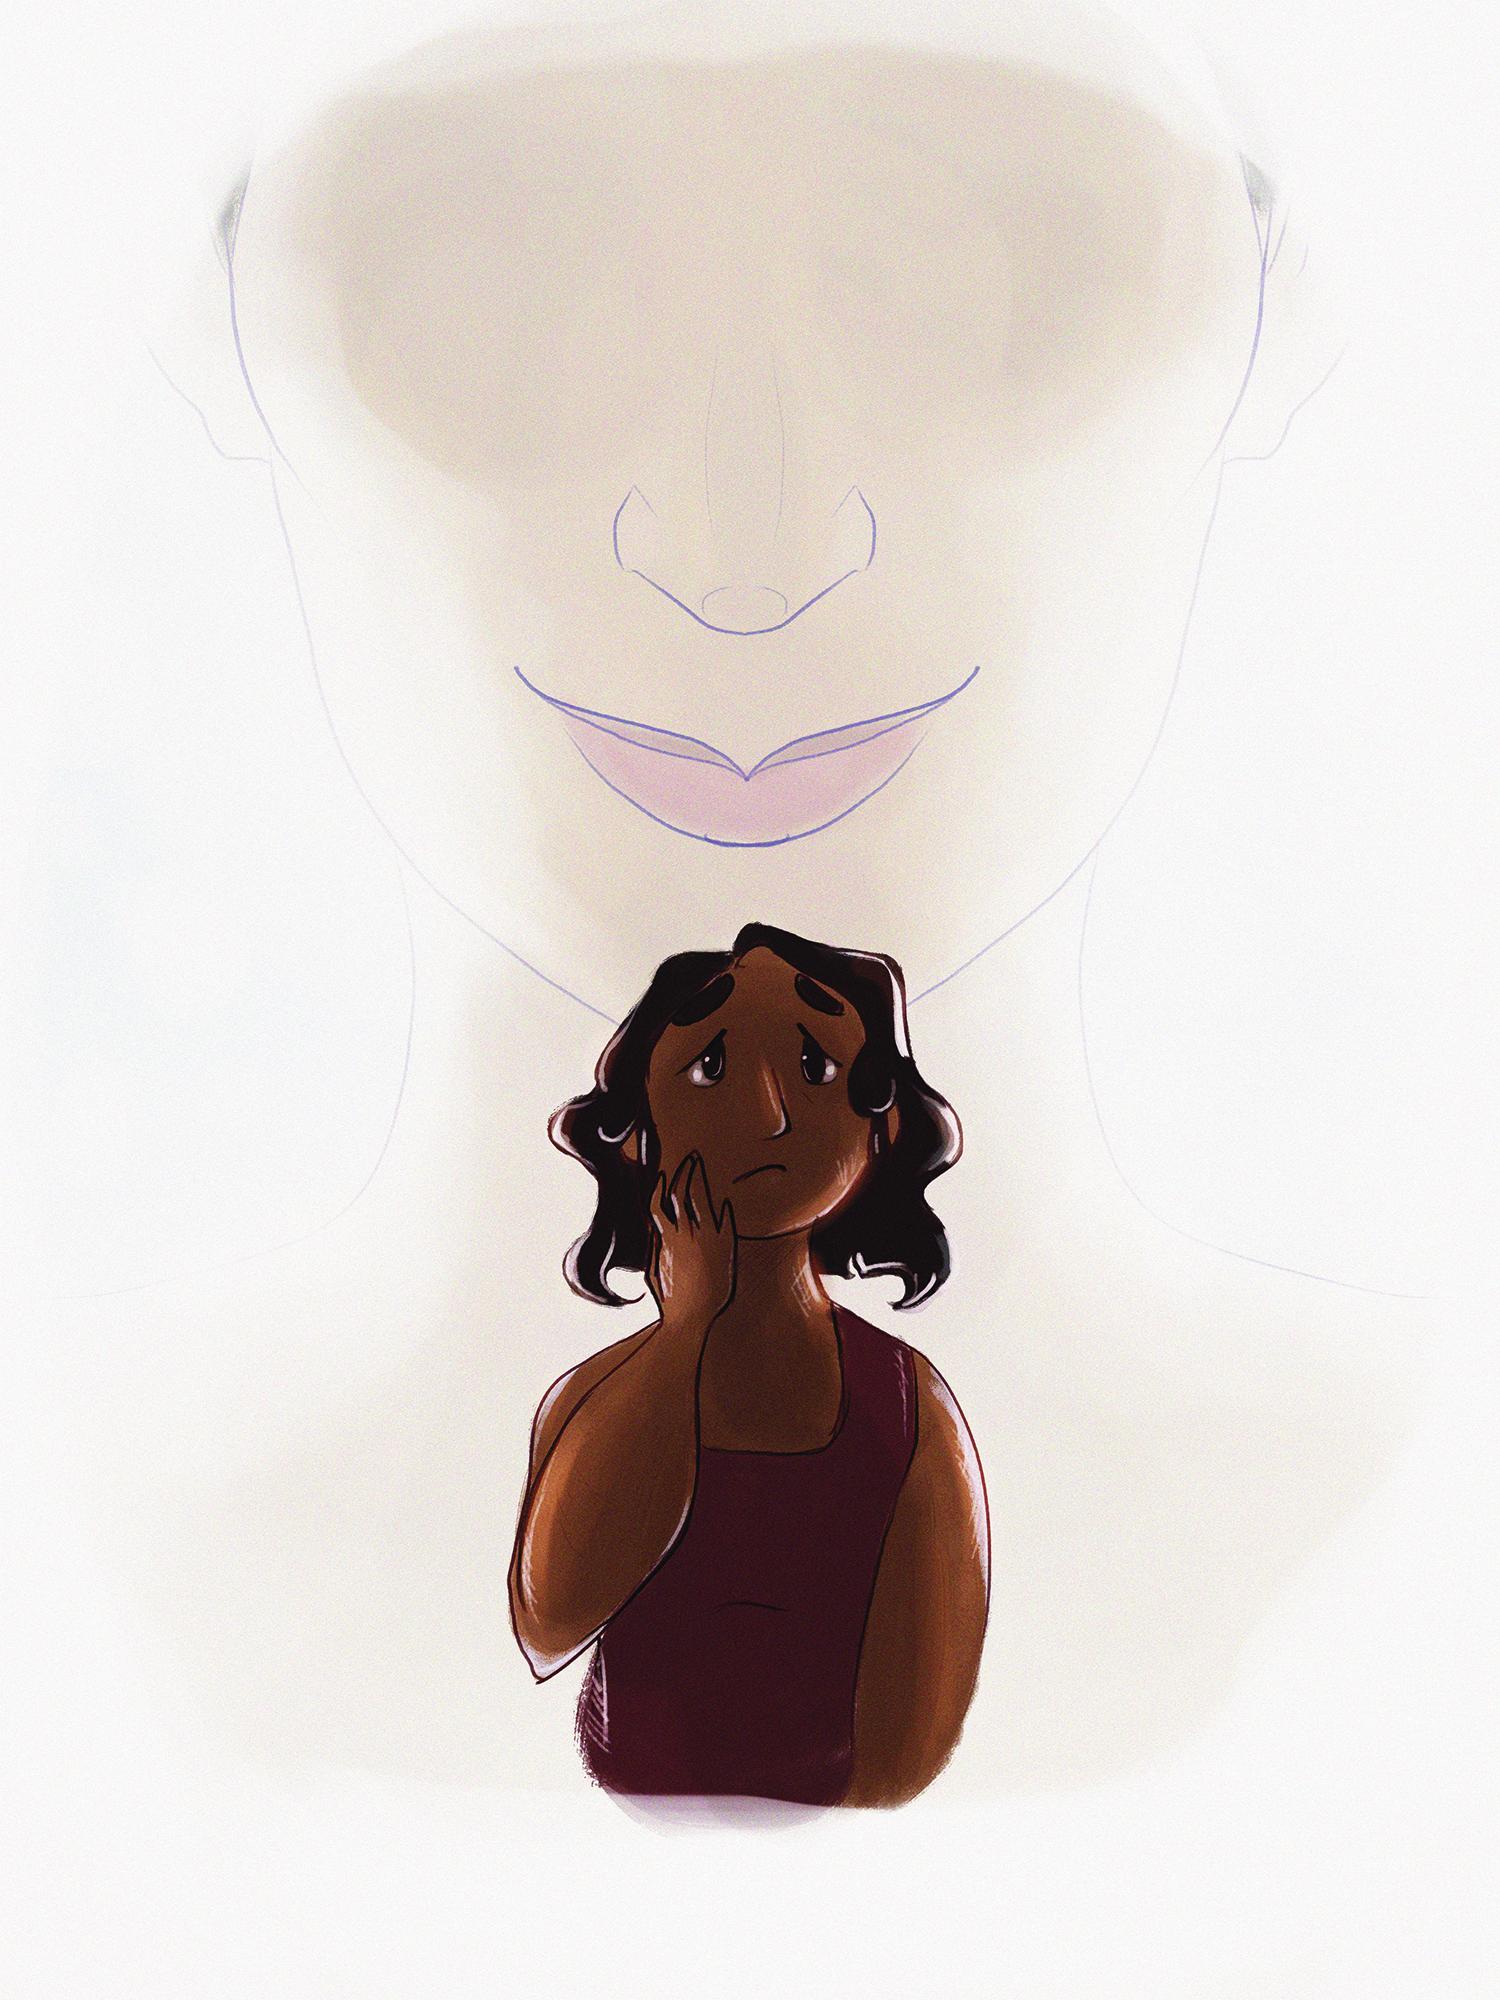 Illustration by Katherine Corley